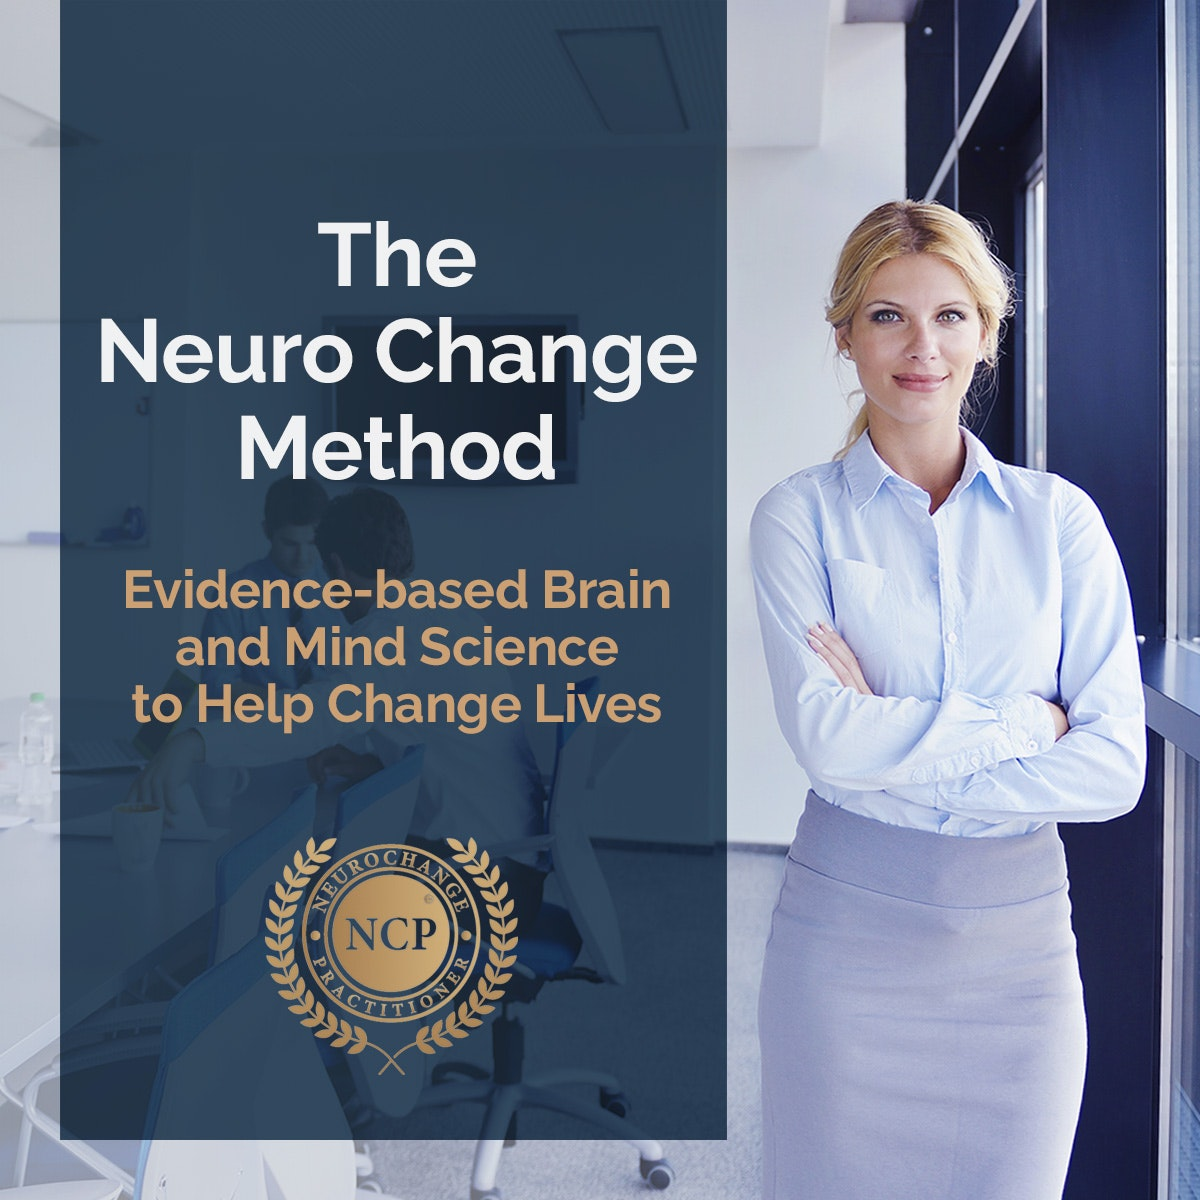 Neuro Change Master training